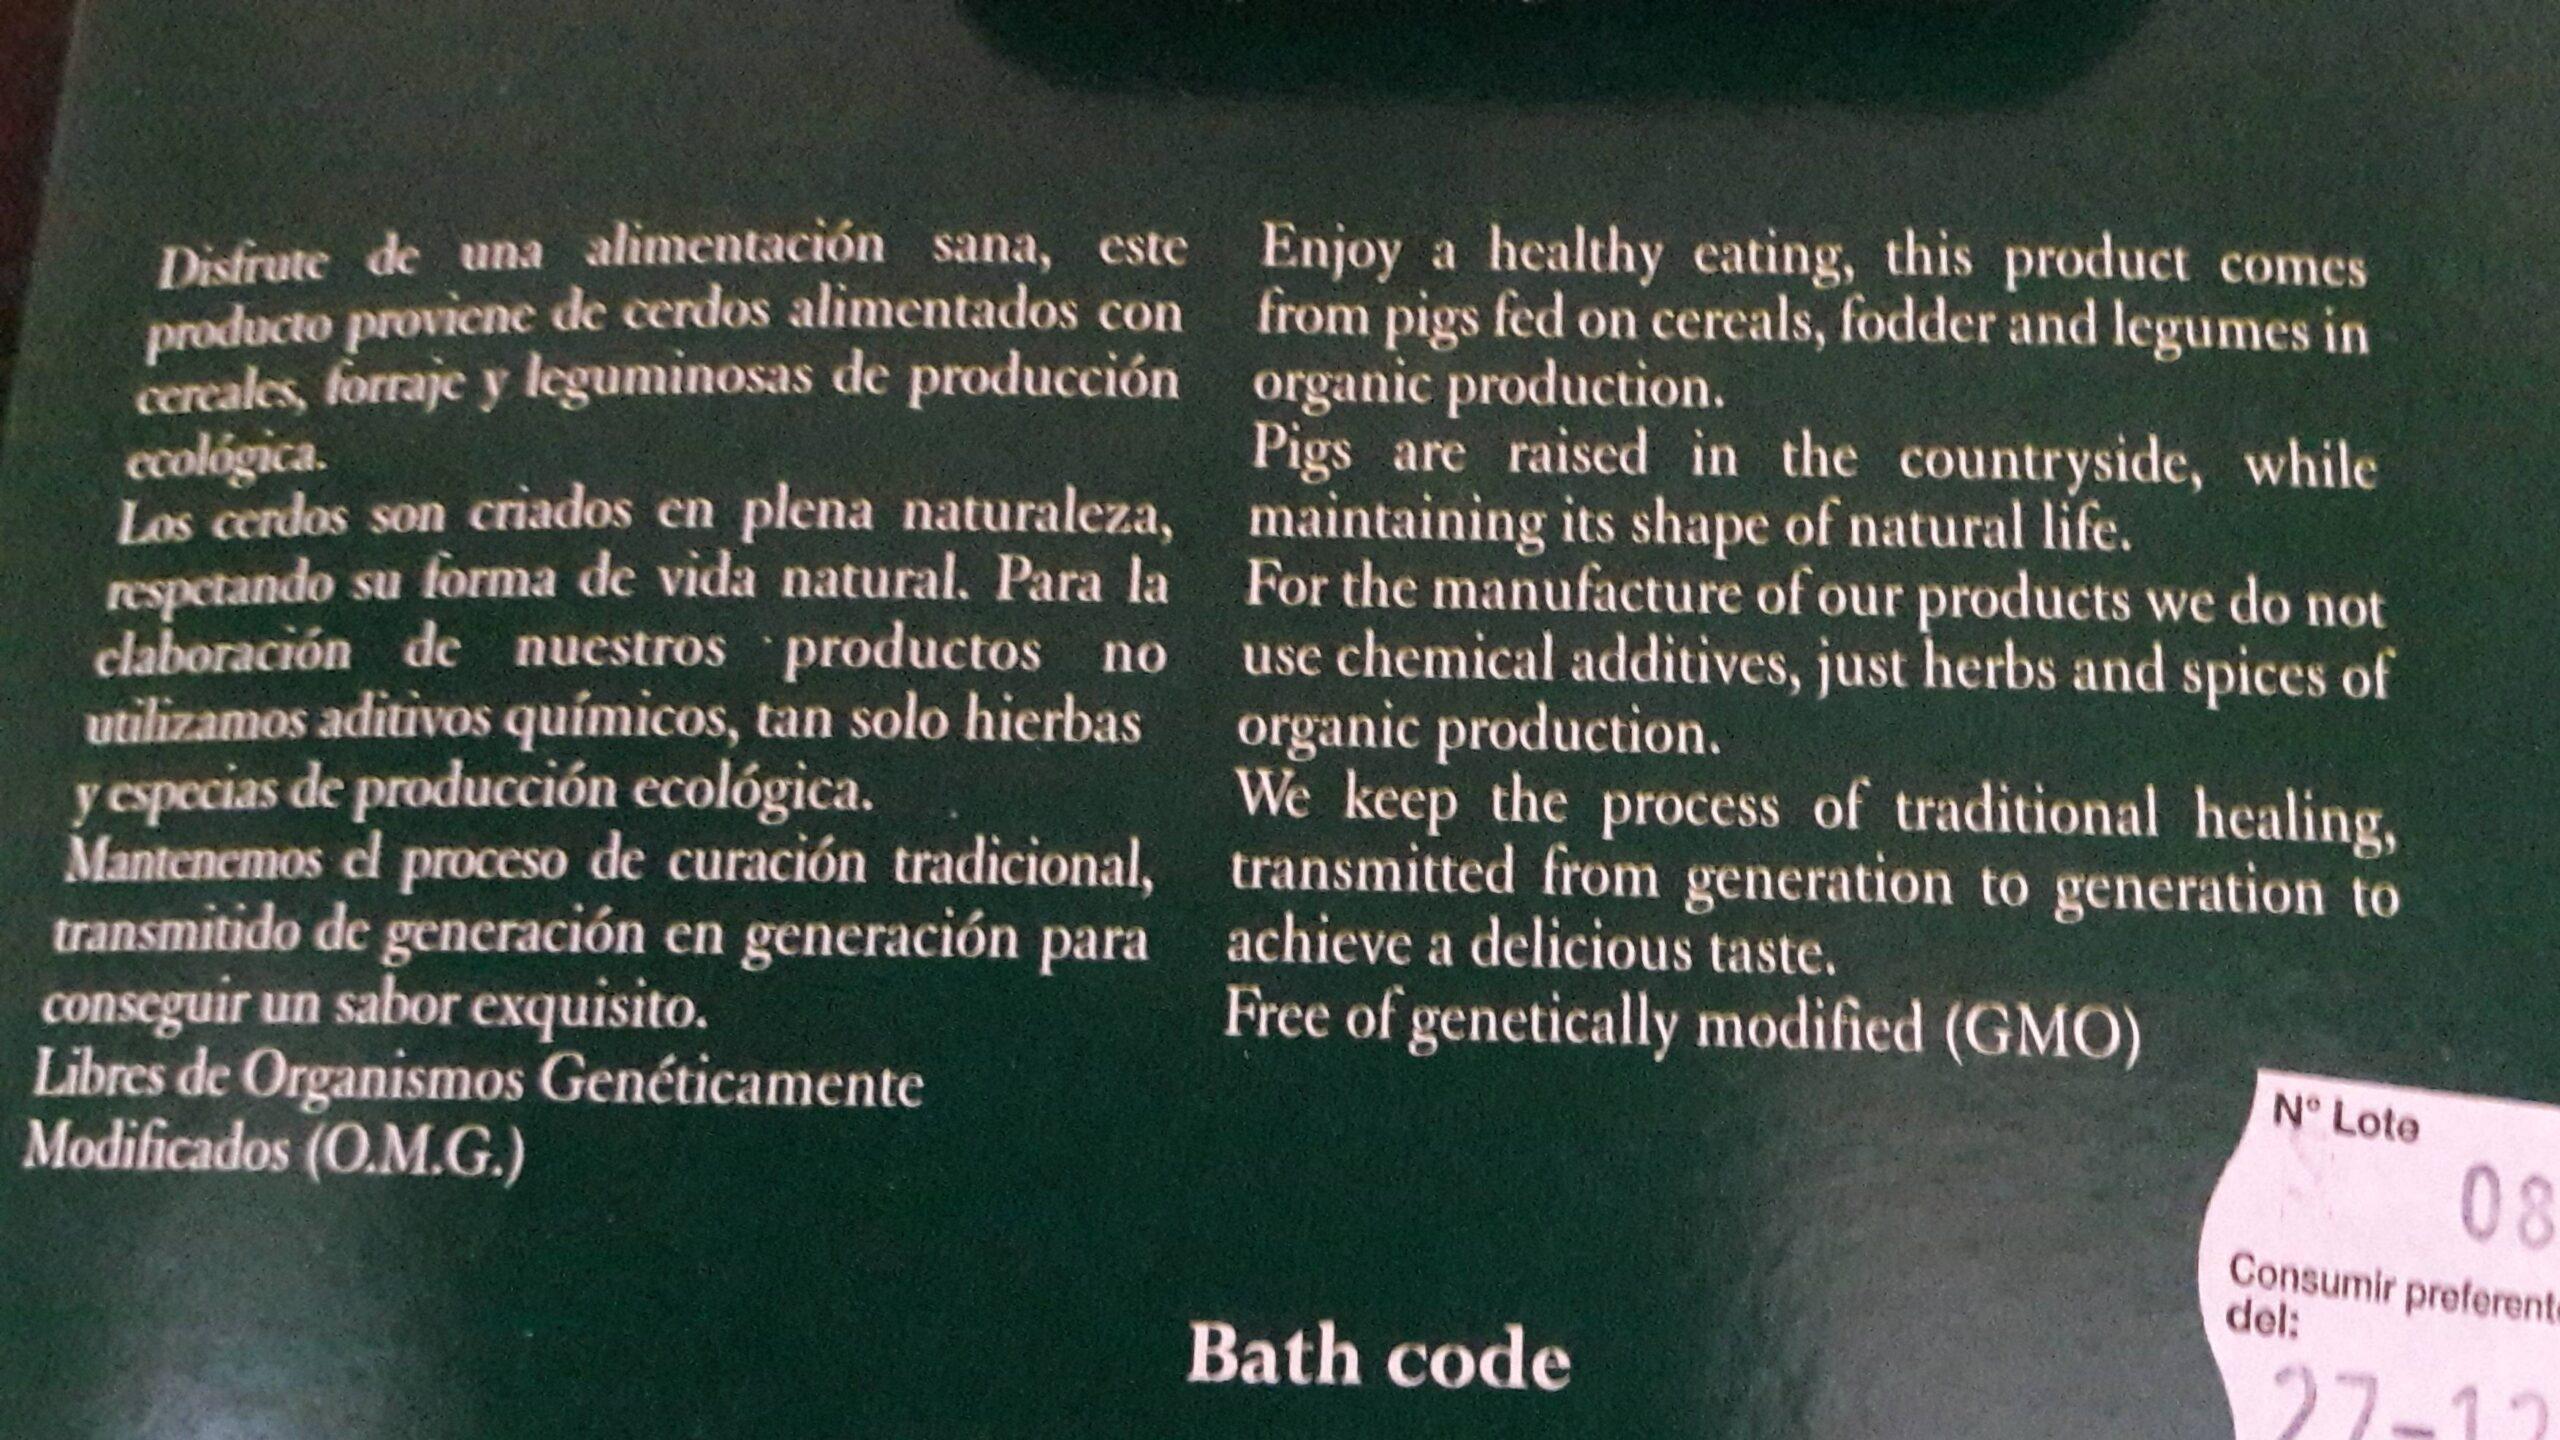 Food label translation services | translation on organic product packaging